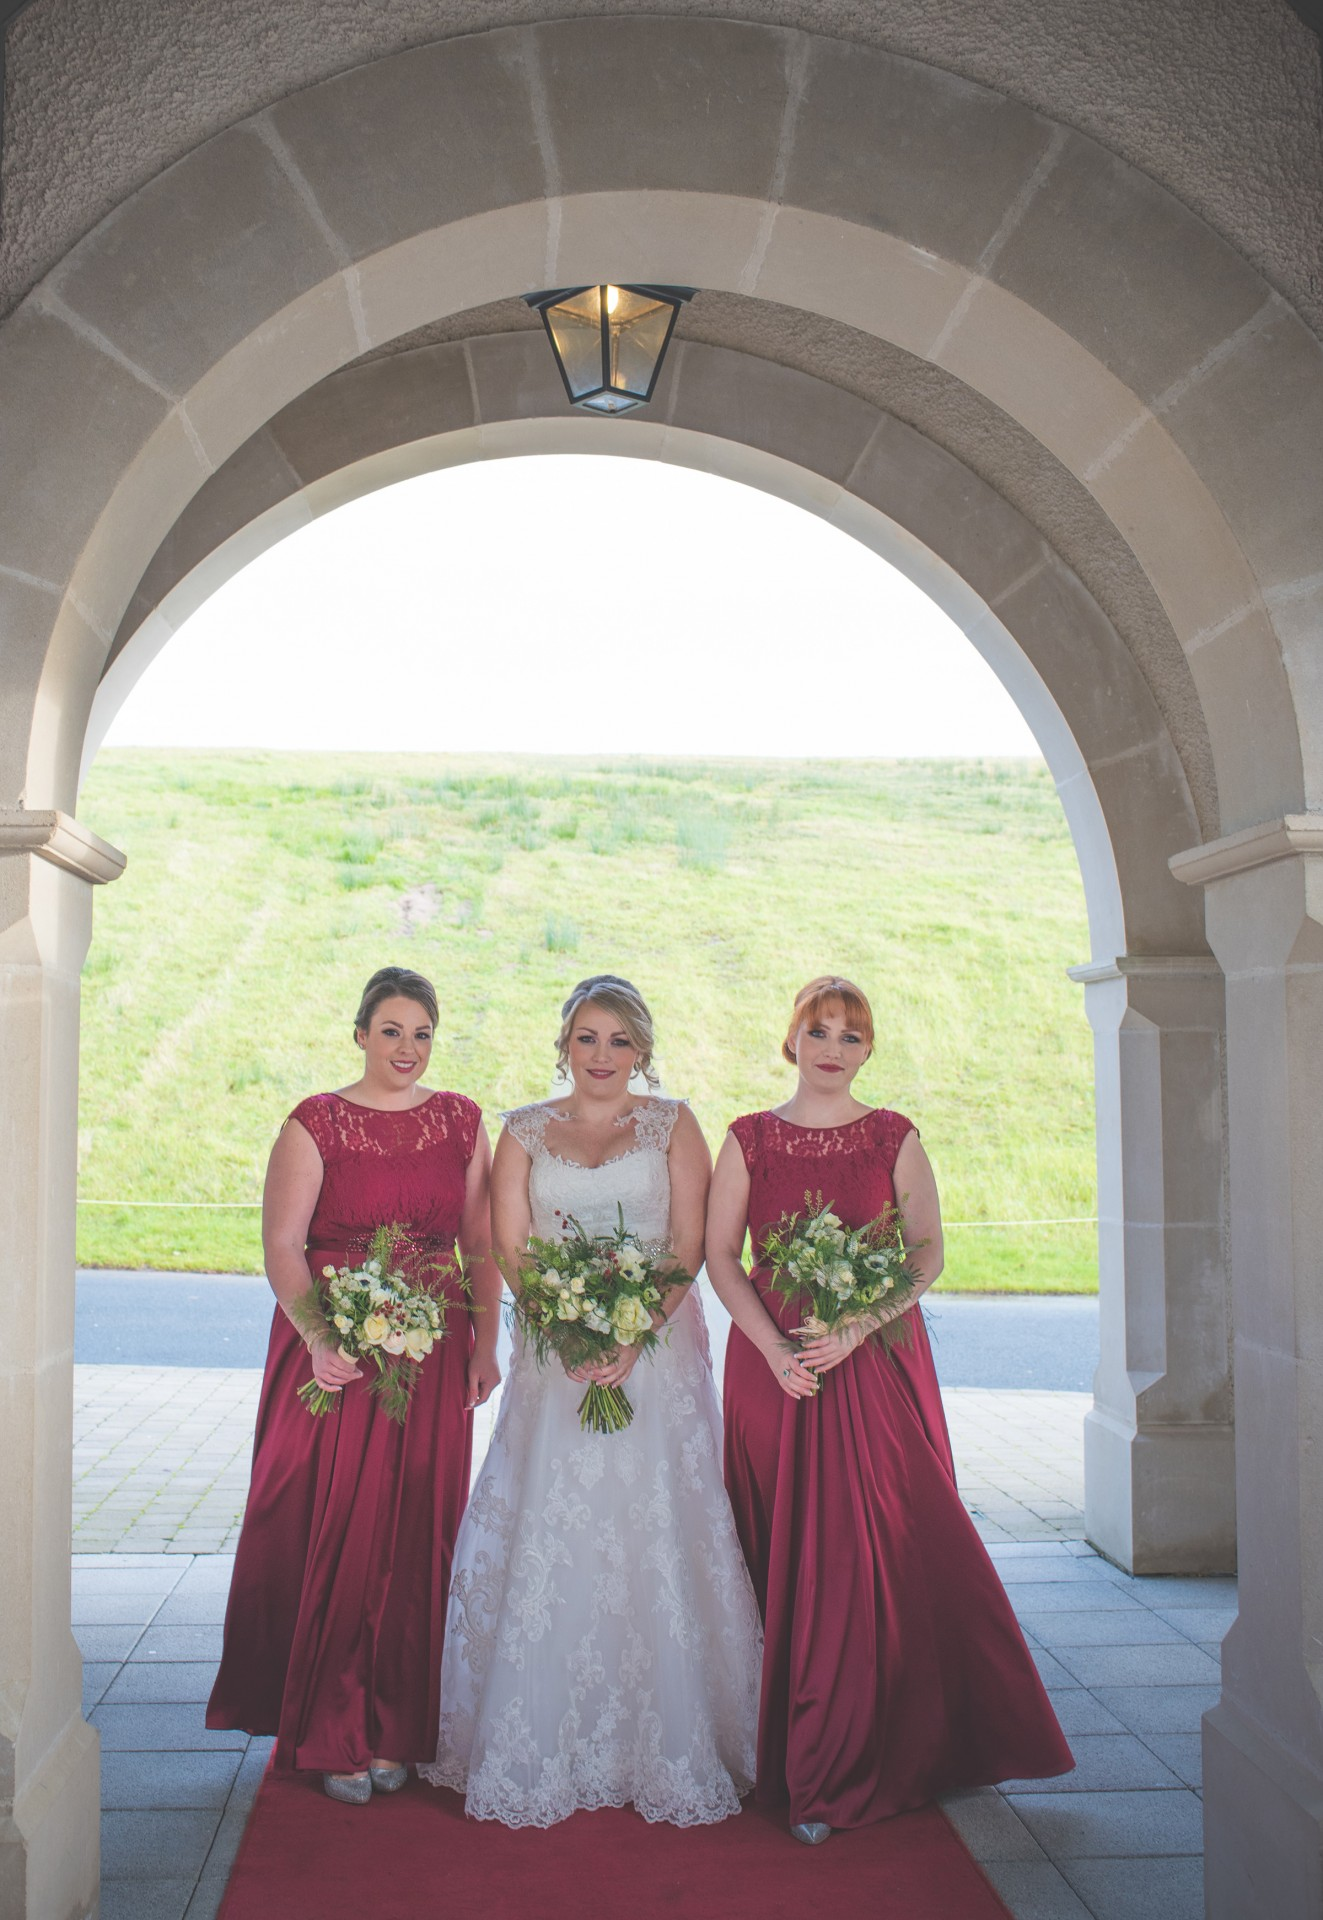 Jamine-James_Caroline-Smyth-Photography_Christmas-Wedding_022